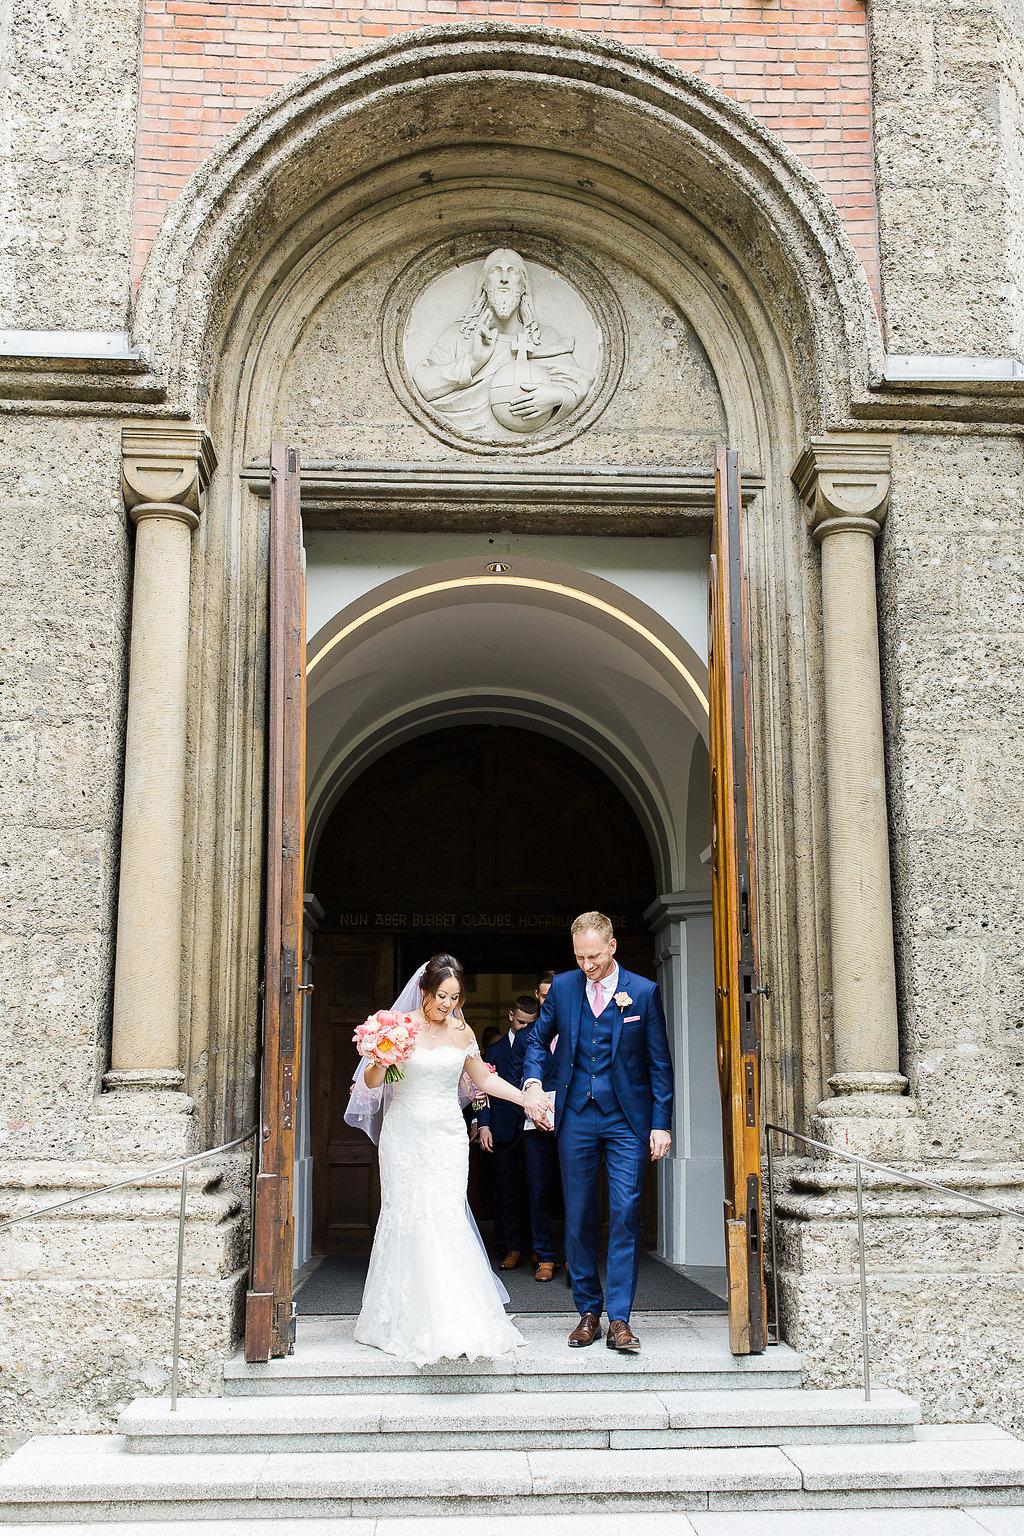 Luxe Navy and Pink Wedding at Schloss Fuschl in Austria by Tanja Kibogo20.JPG